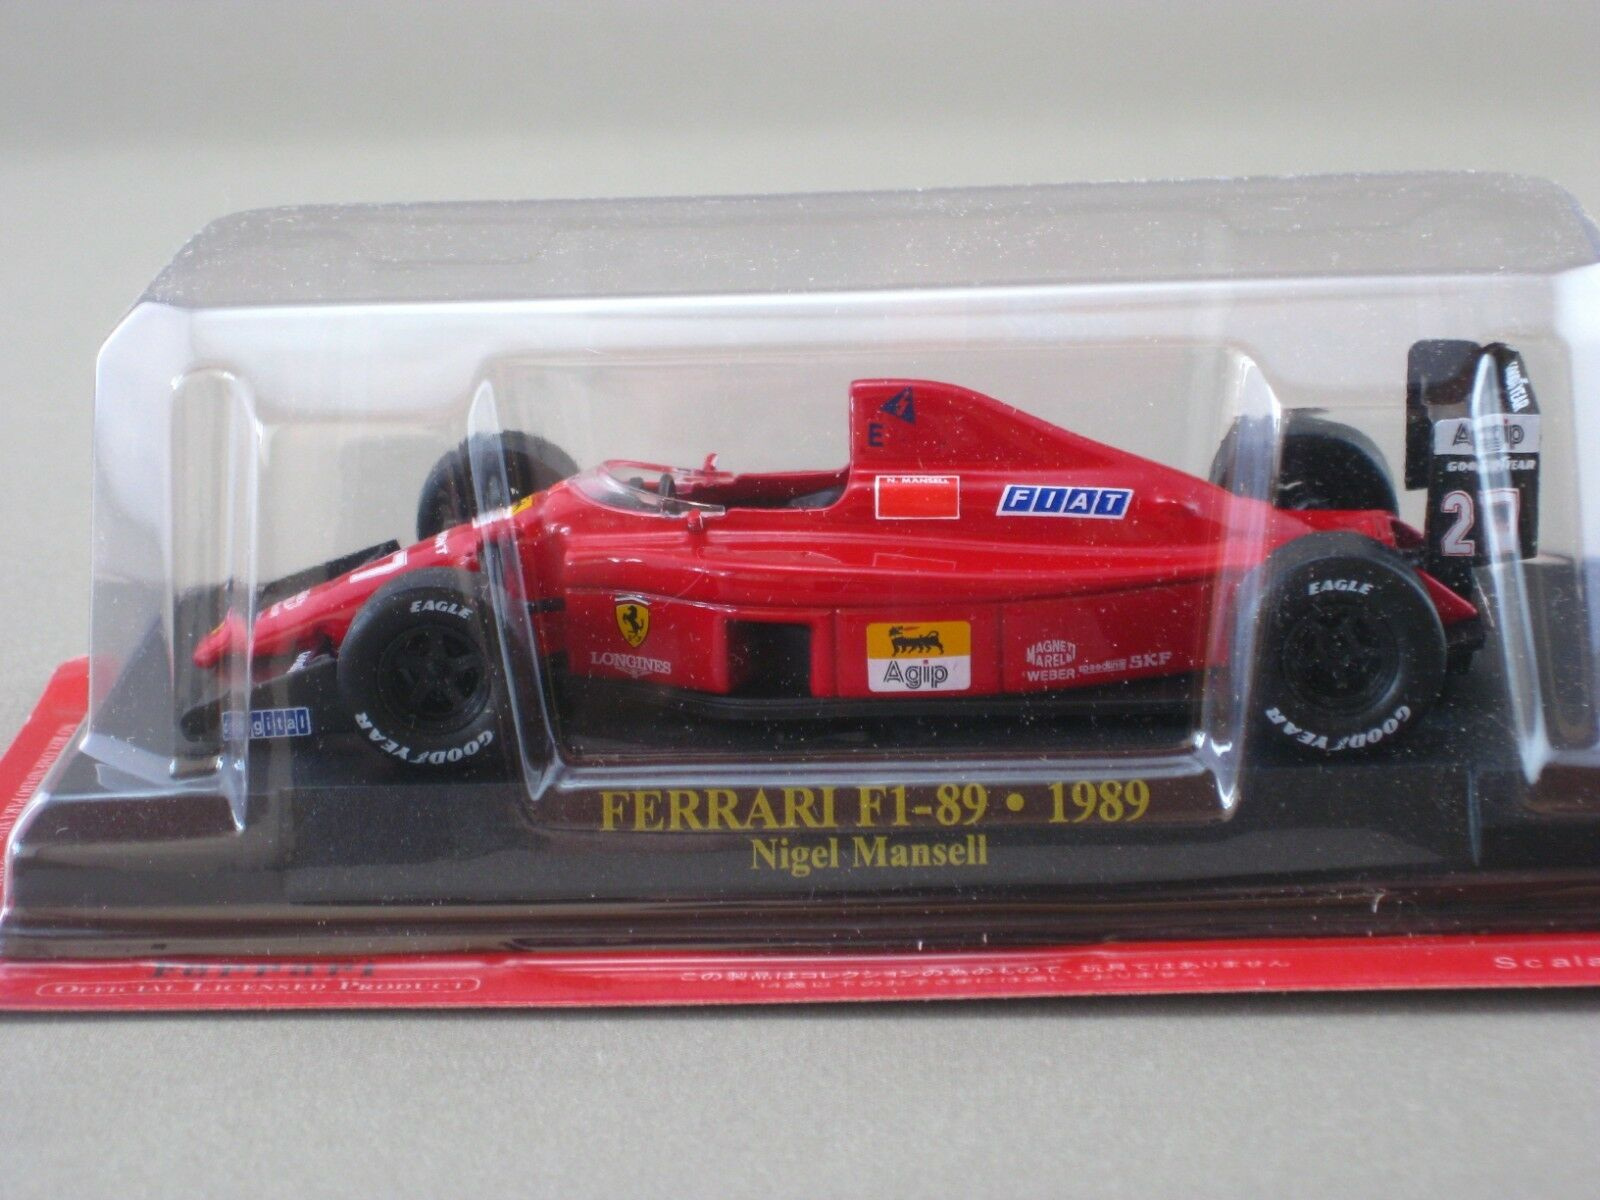 Ferrari F1 89 1989 Nigel Mansell hachette 1 43 Diecast Model Car Vol.19